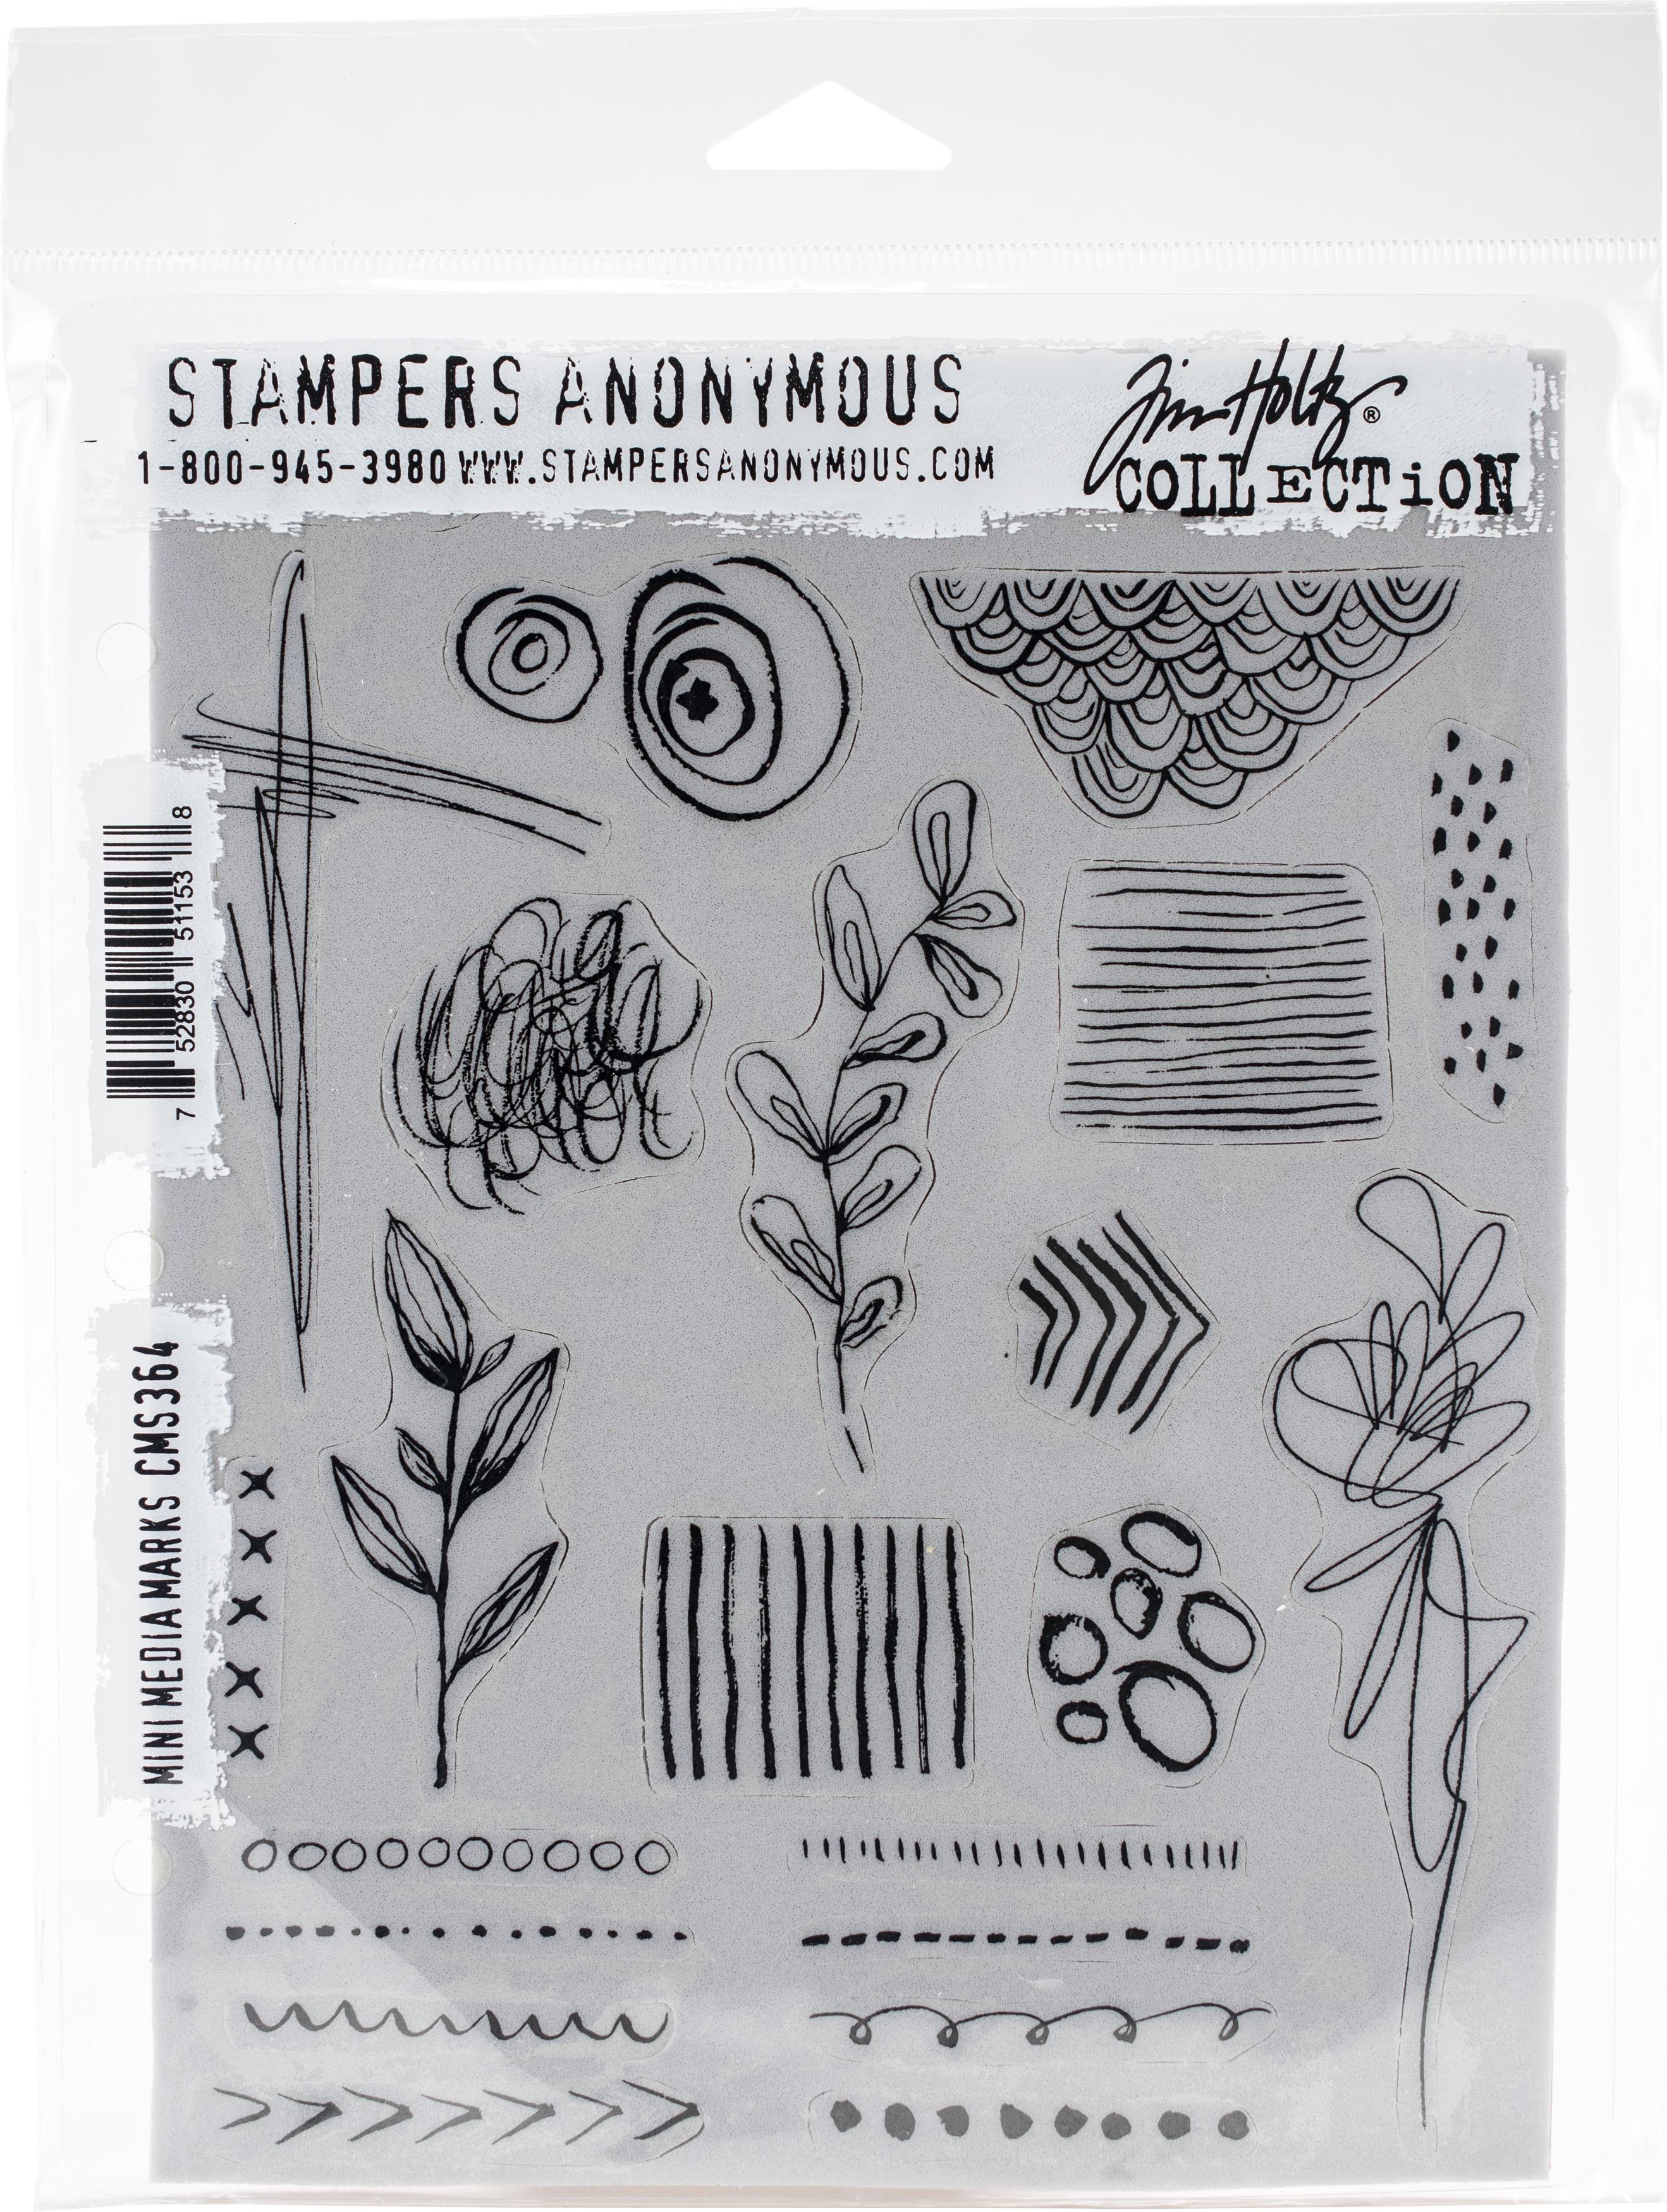 Tim Holtz - Mini Media Marks Cling Stamp